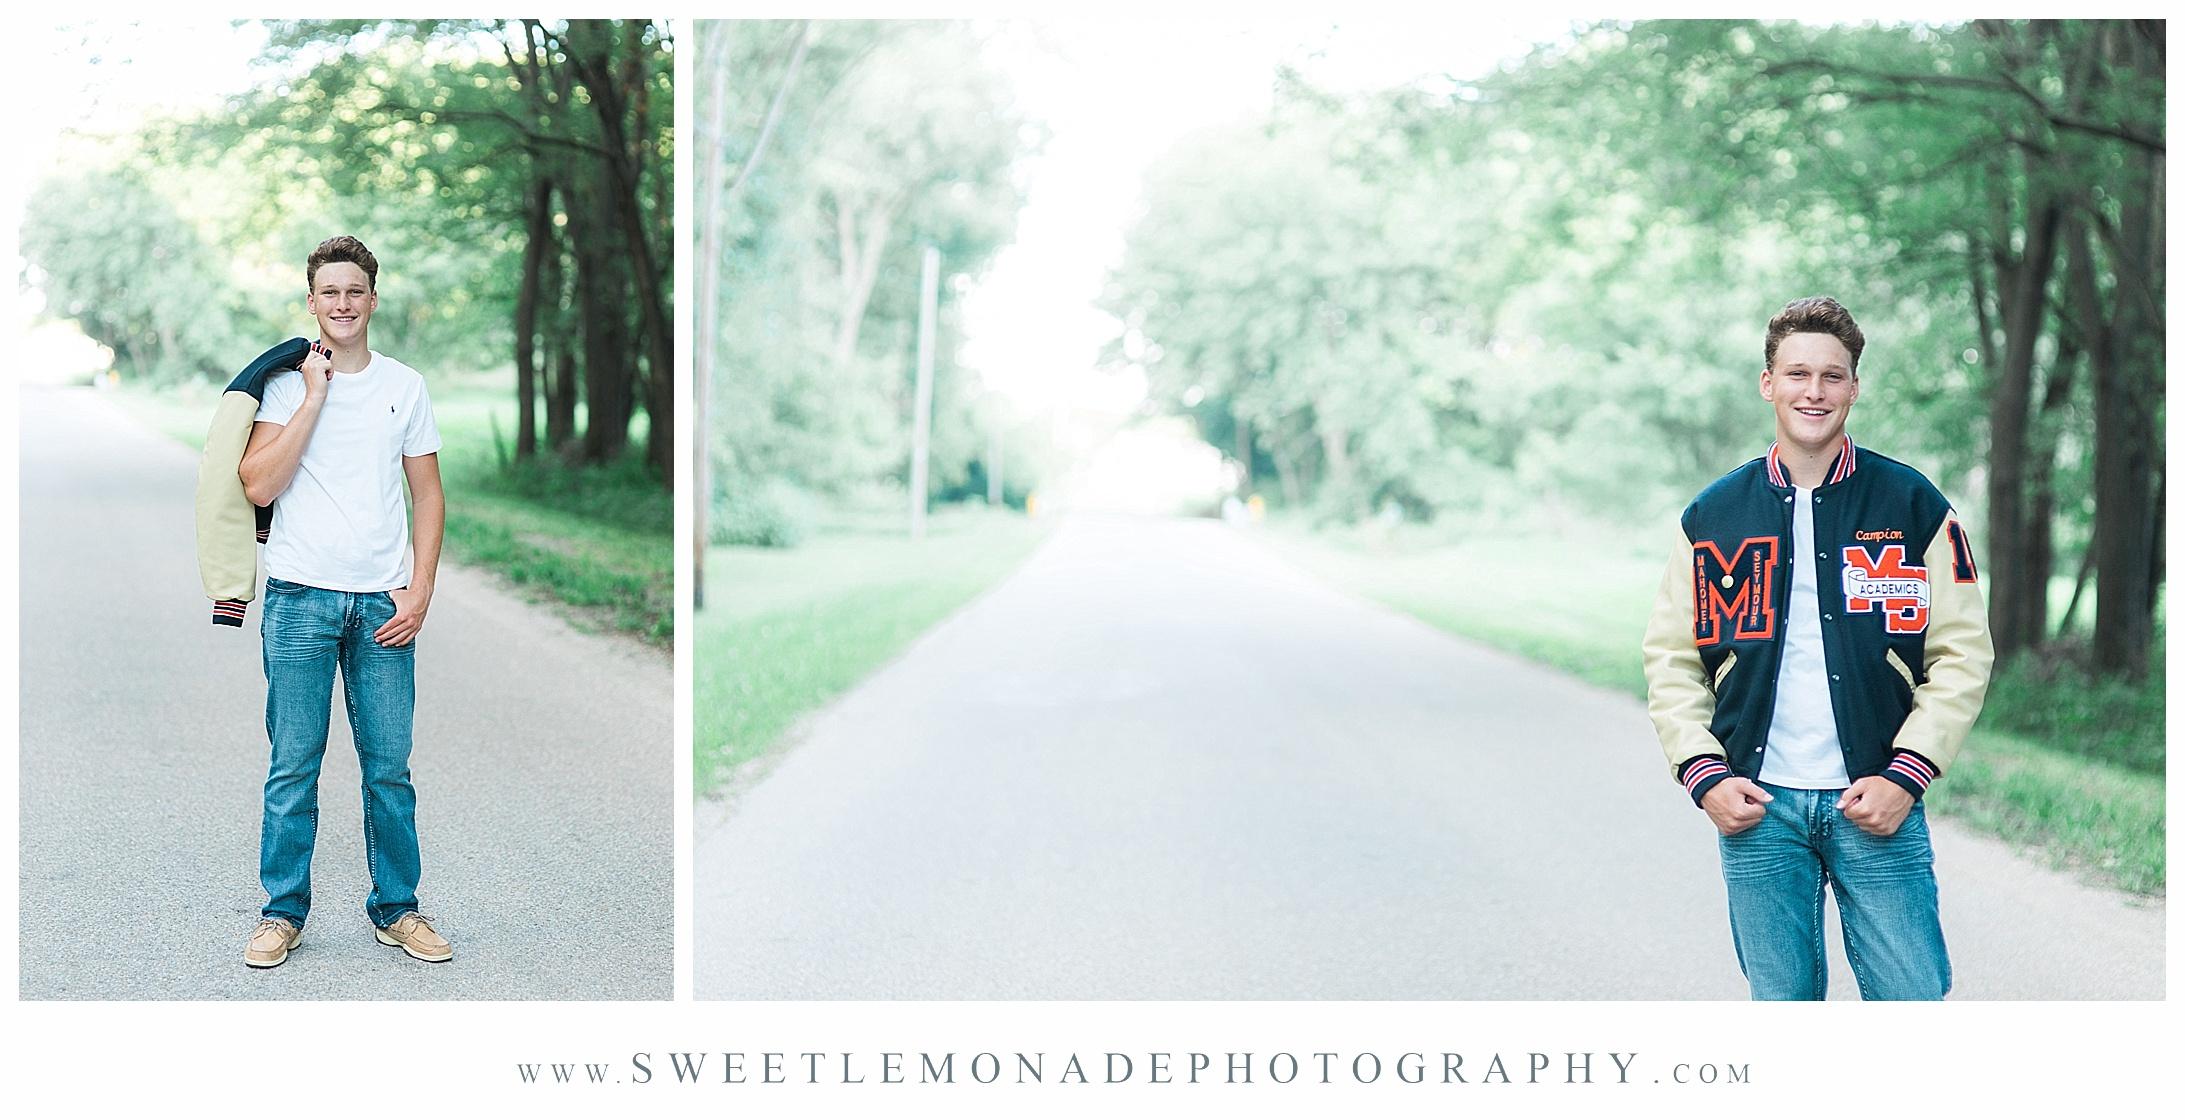 champaign-county-senior-pictures-photographer-sweet-lemonade-photography_2117.jpg